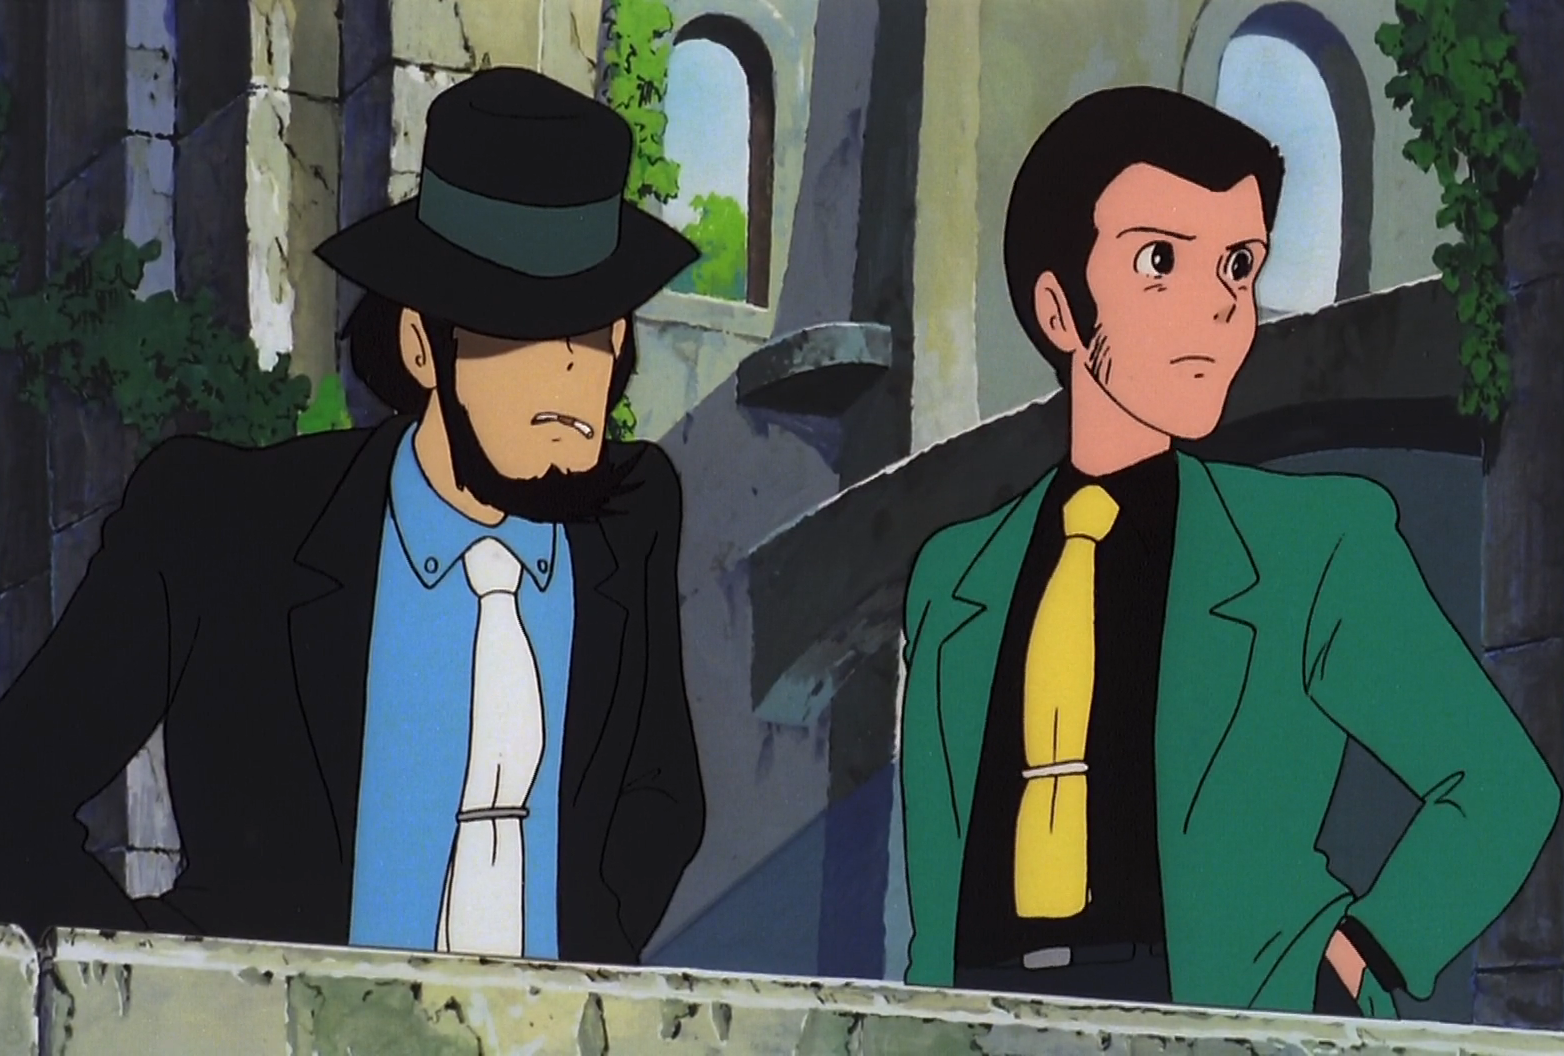 Daisuke and Lupin III_Haruhichan.com_